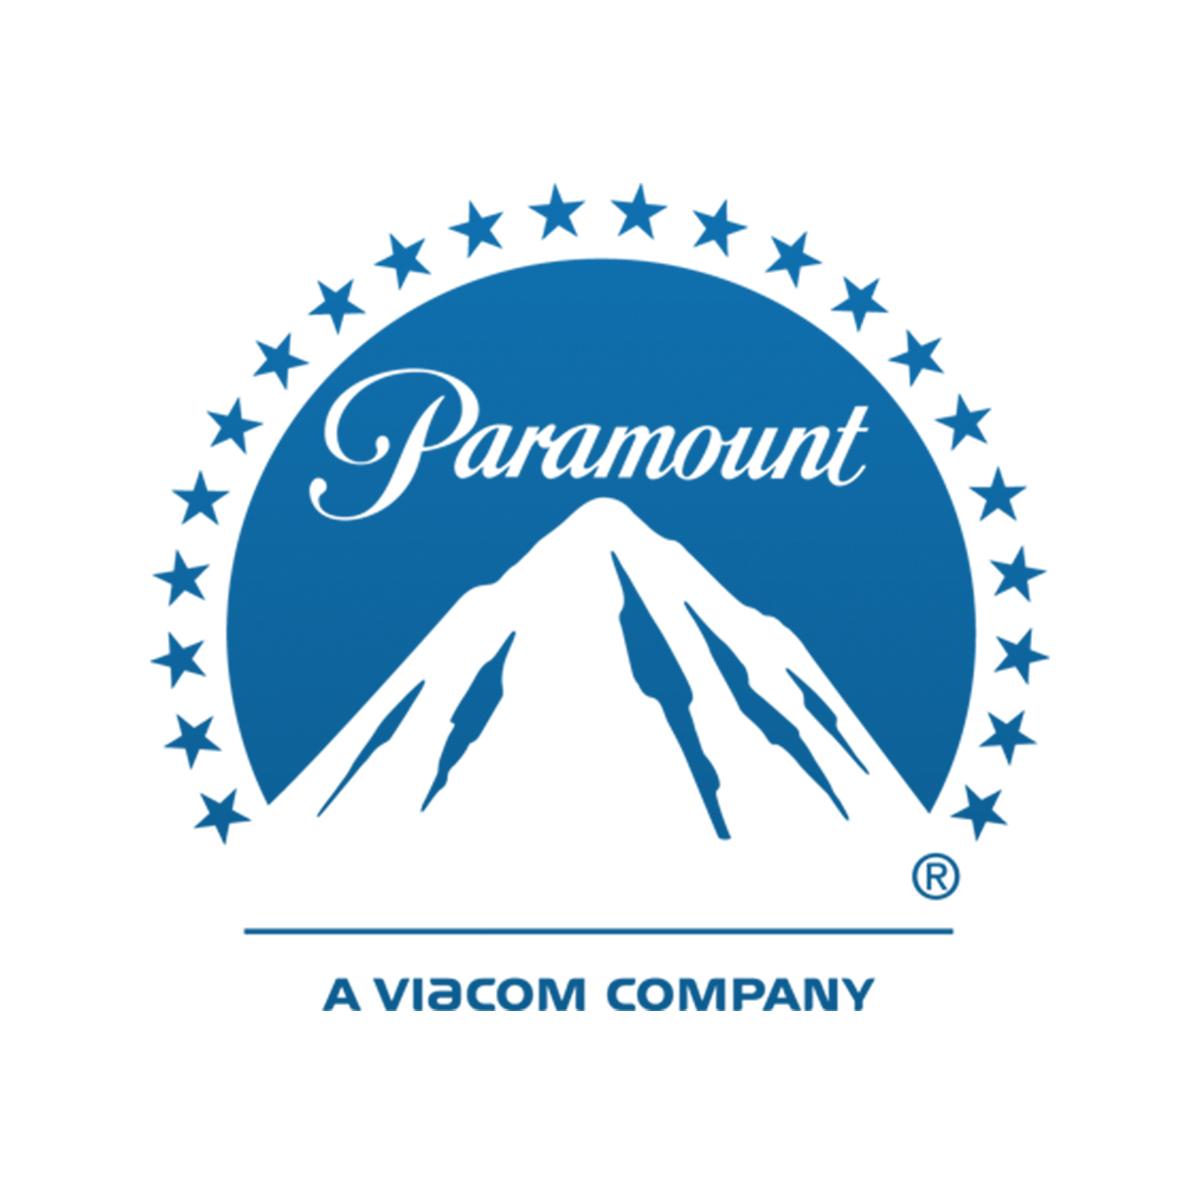 B2B Brand Logos_0015_paramount-logo-grid-new.jpg